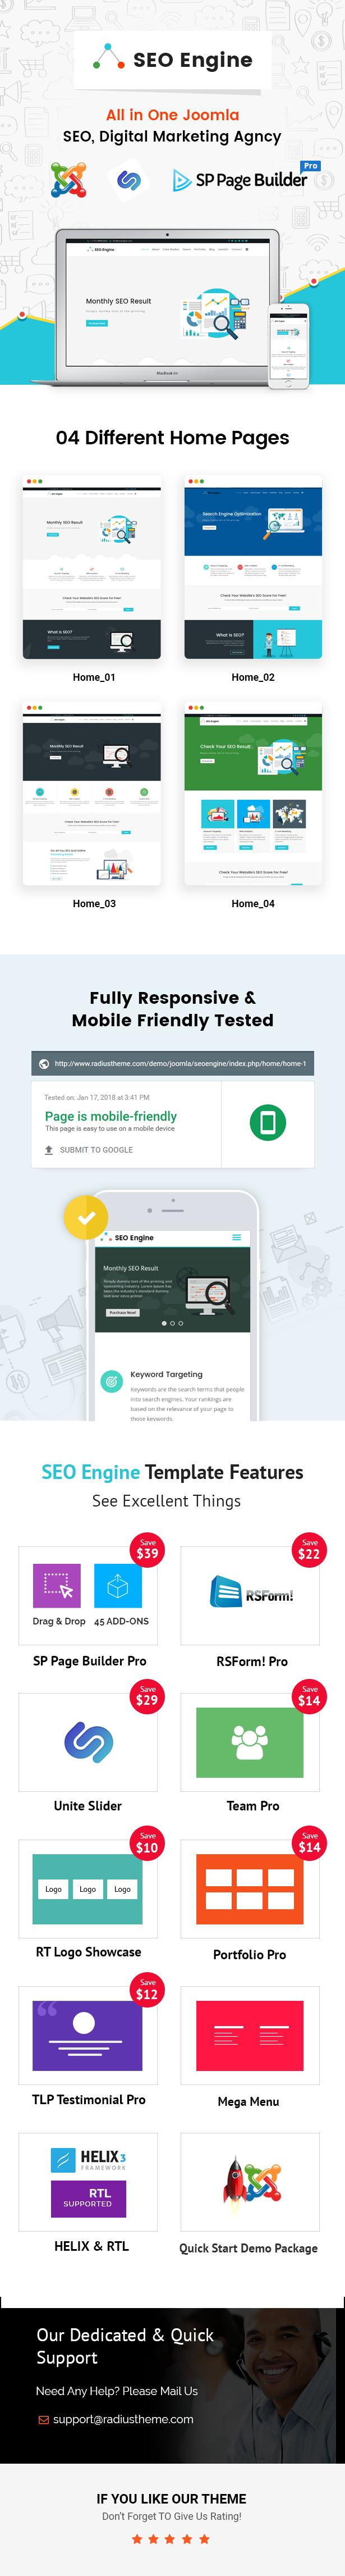 SEOEngine - SEO & Digital Marketing Agency Joomla Template by ...